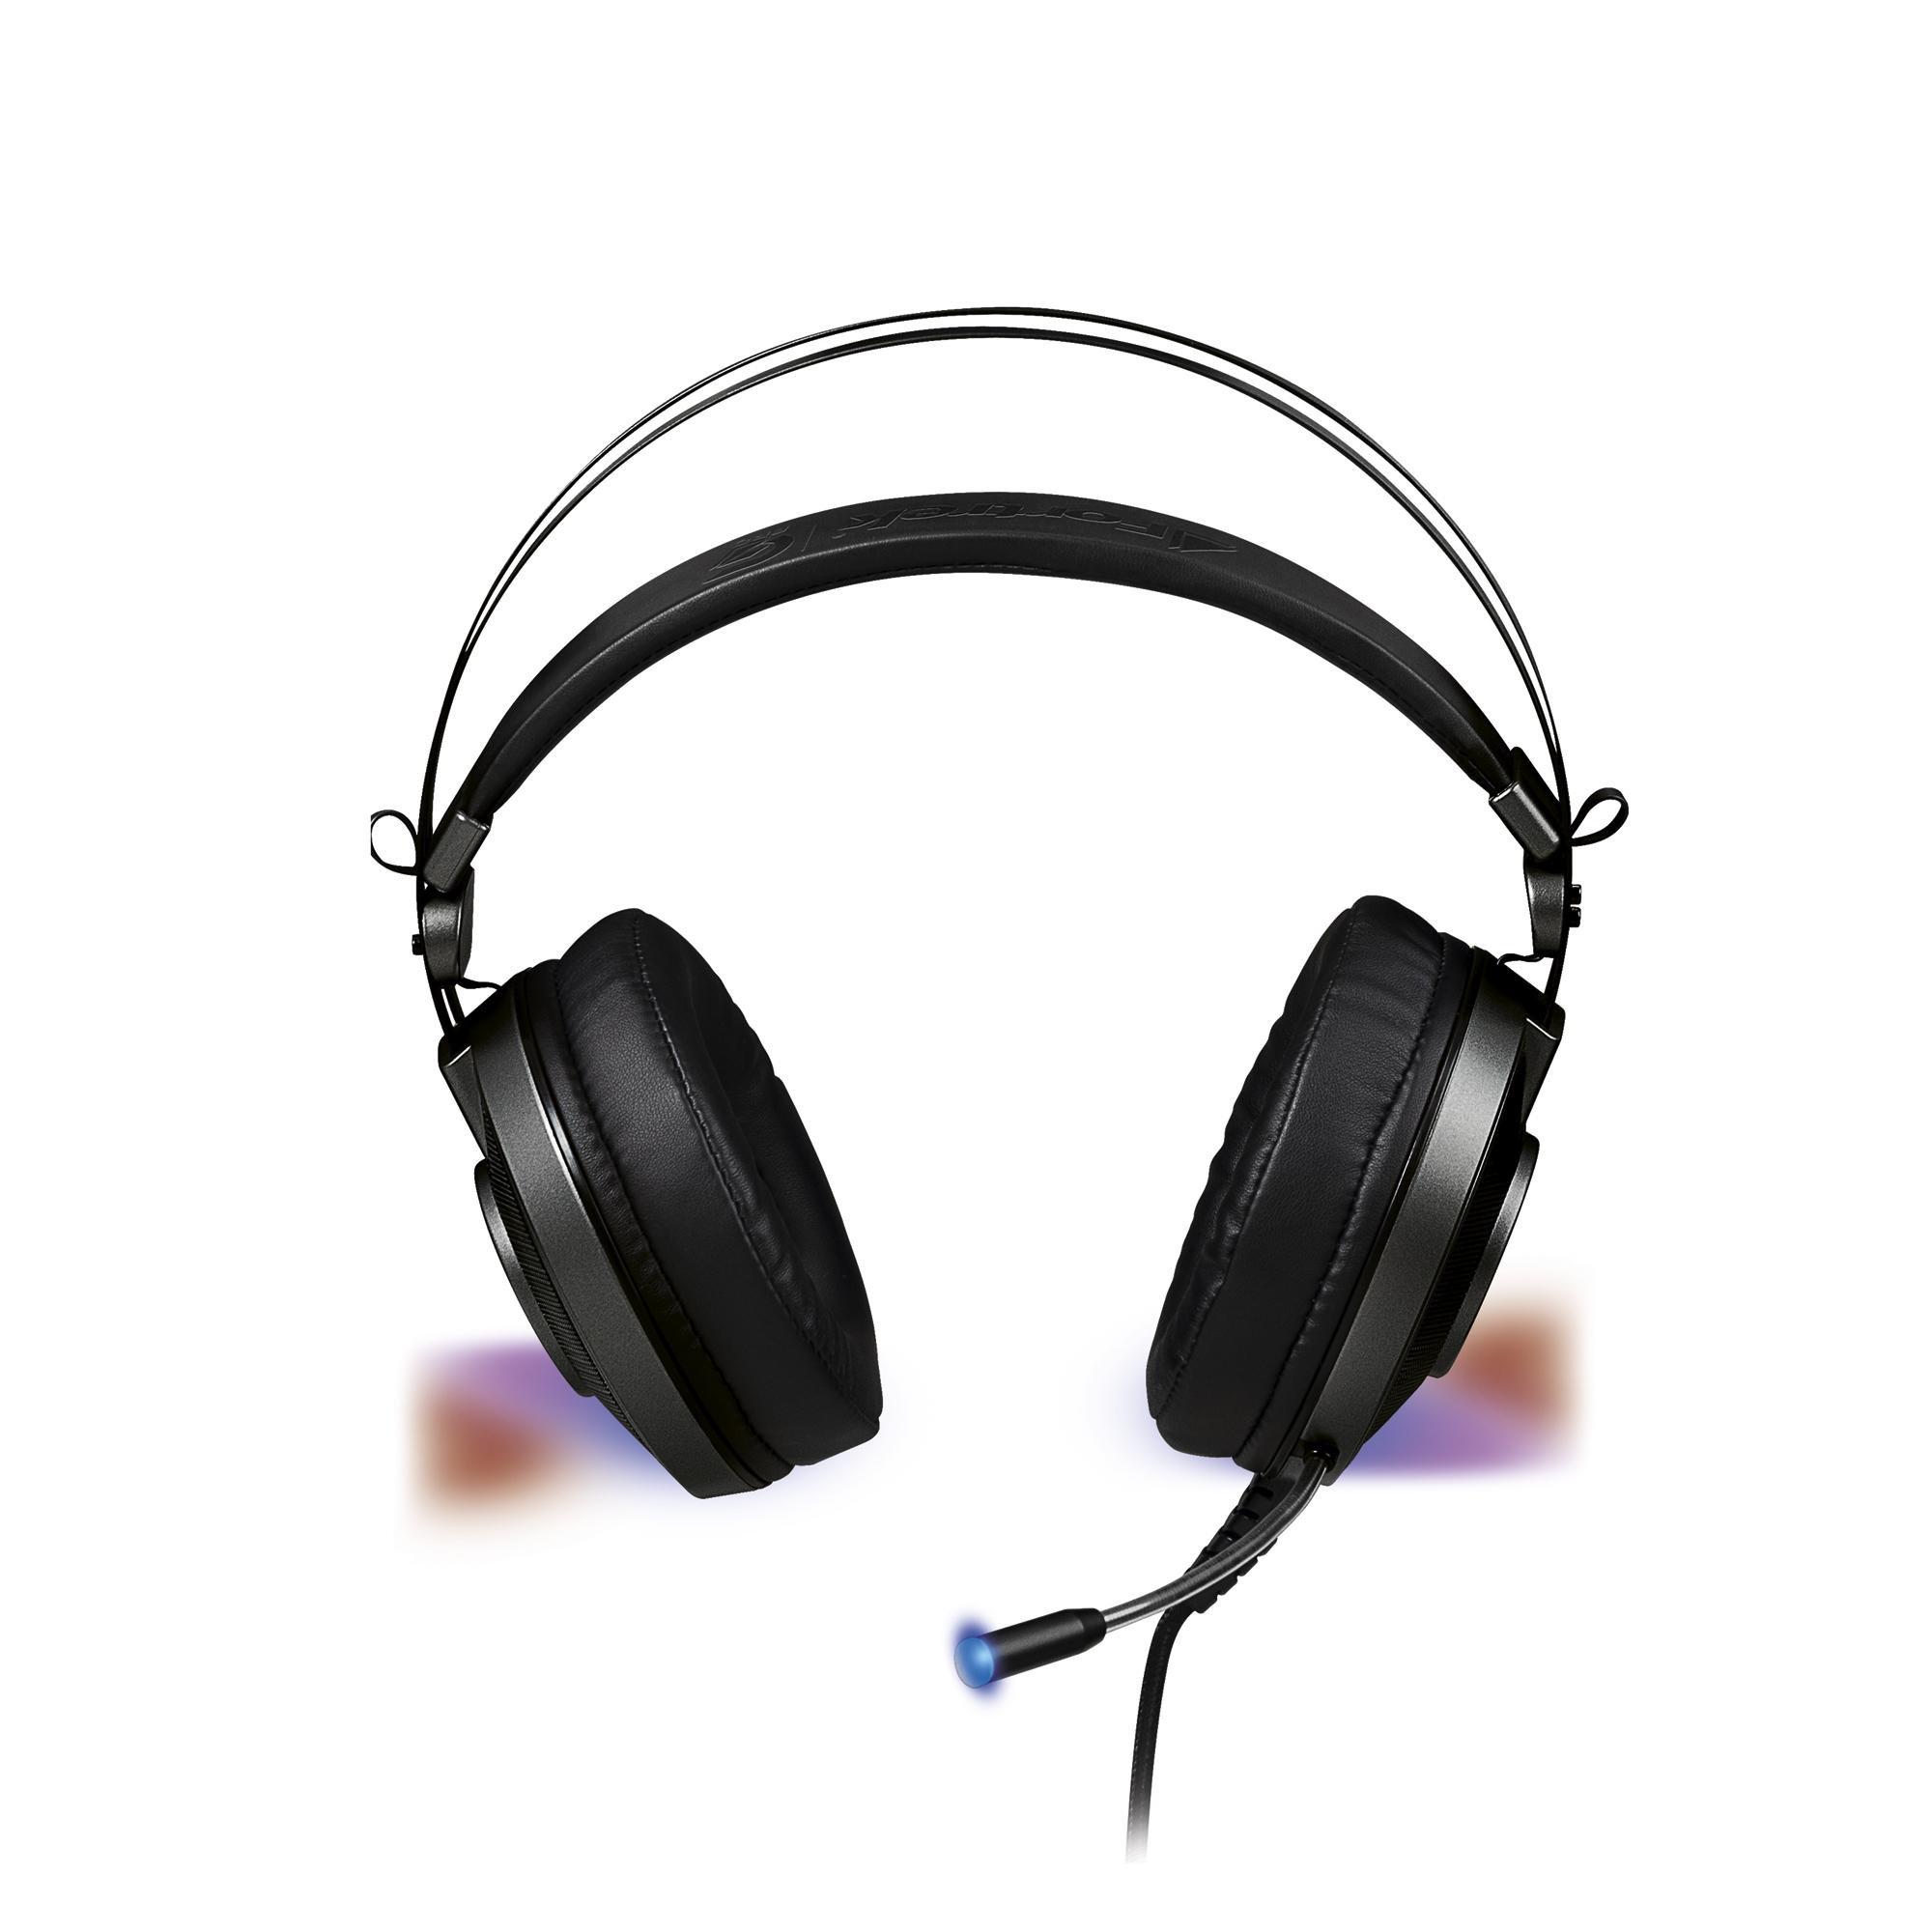 fone de ouvido disponivel somente aqui fortrek h3 cinza rgb g pro headset gamer com microfone 47318 2000 197239 1